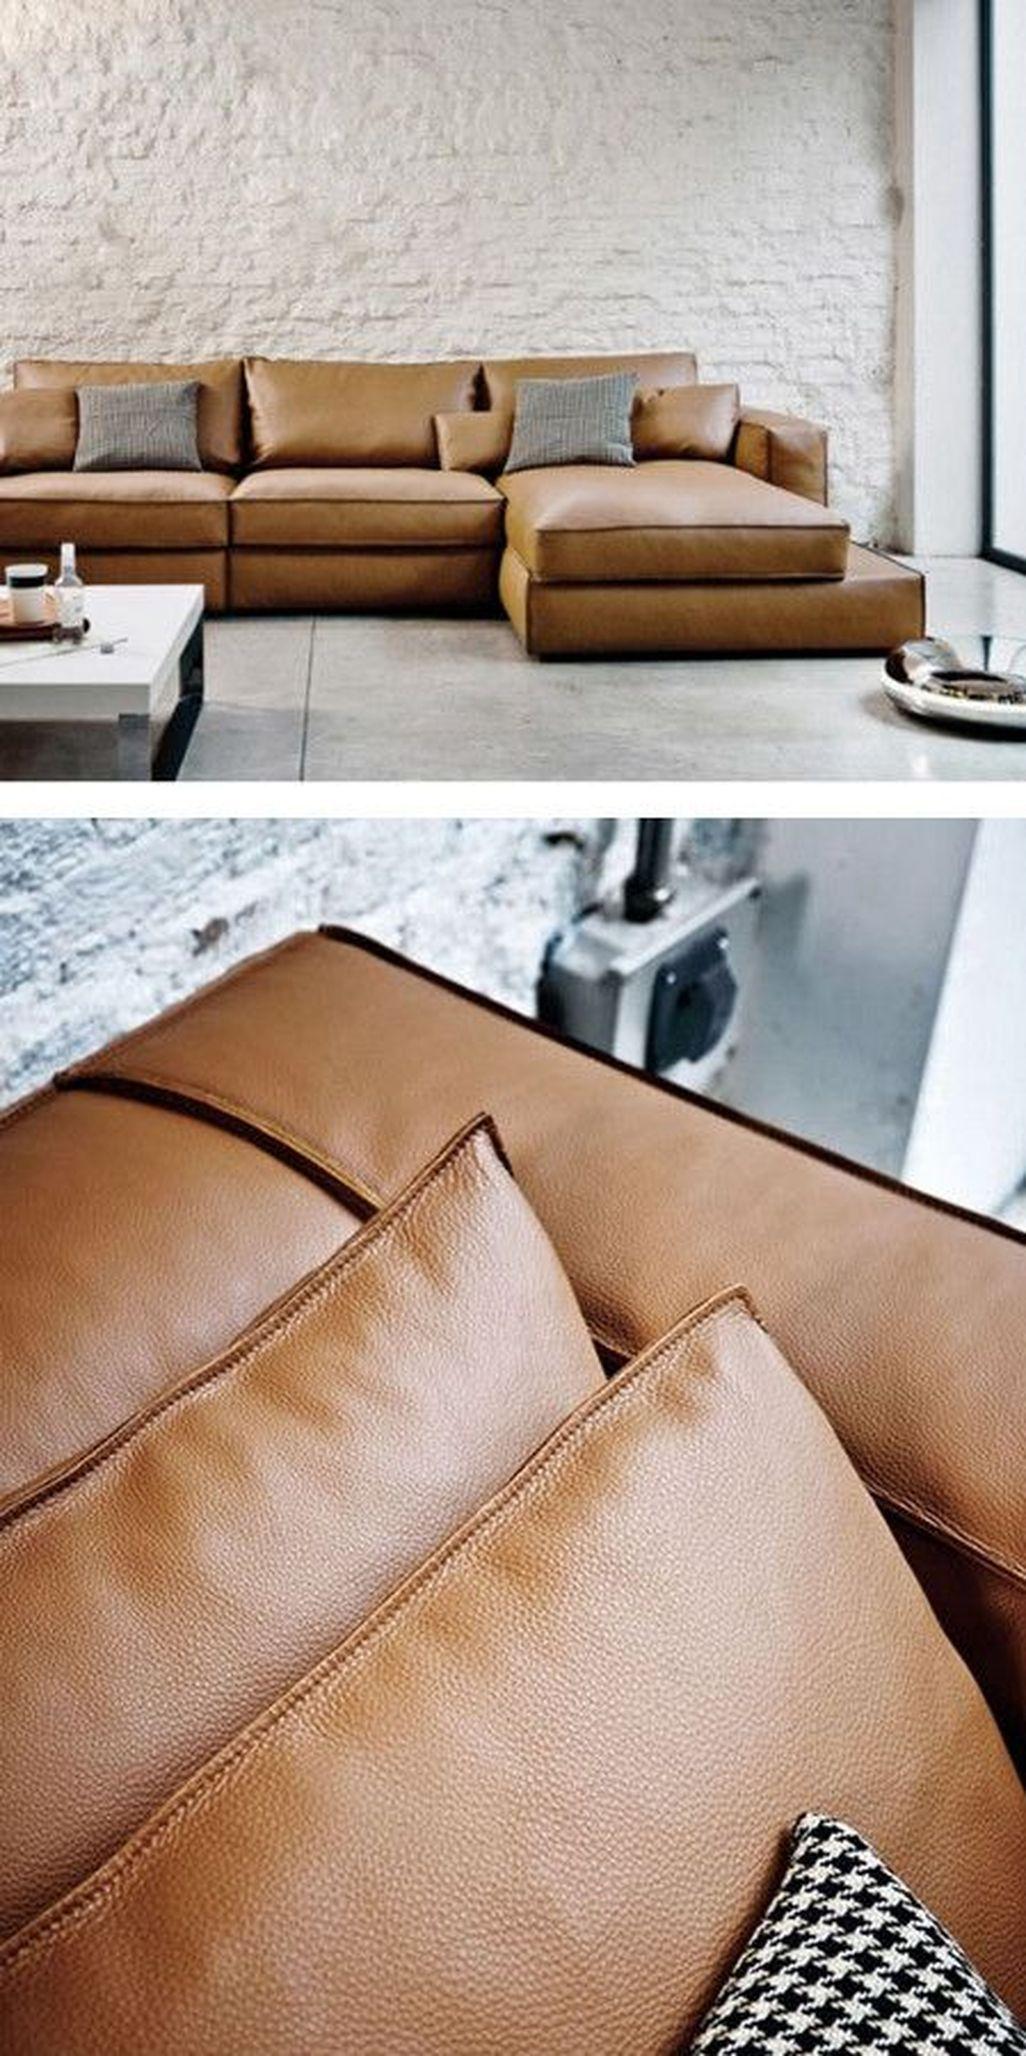 Pin By Revolution House Mag On Sofa Design Ideas Sofa Colors Leather Sofa Living Room Sofa Design